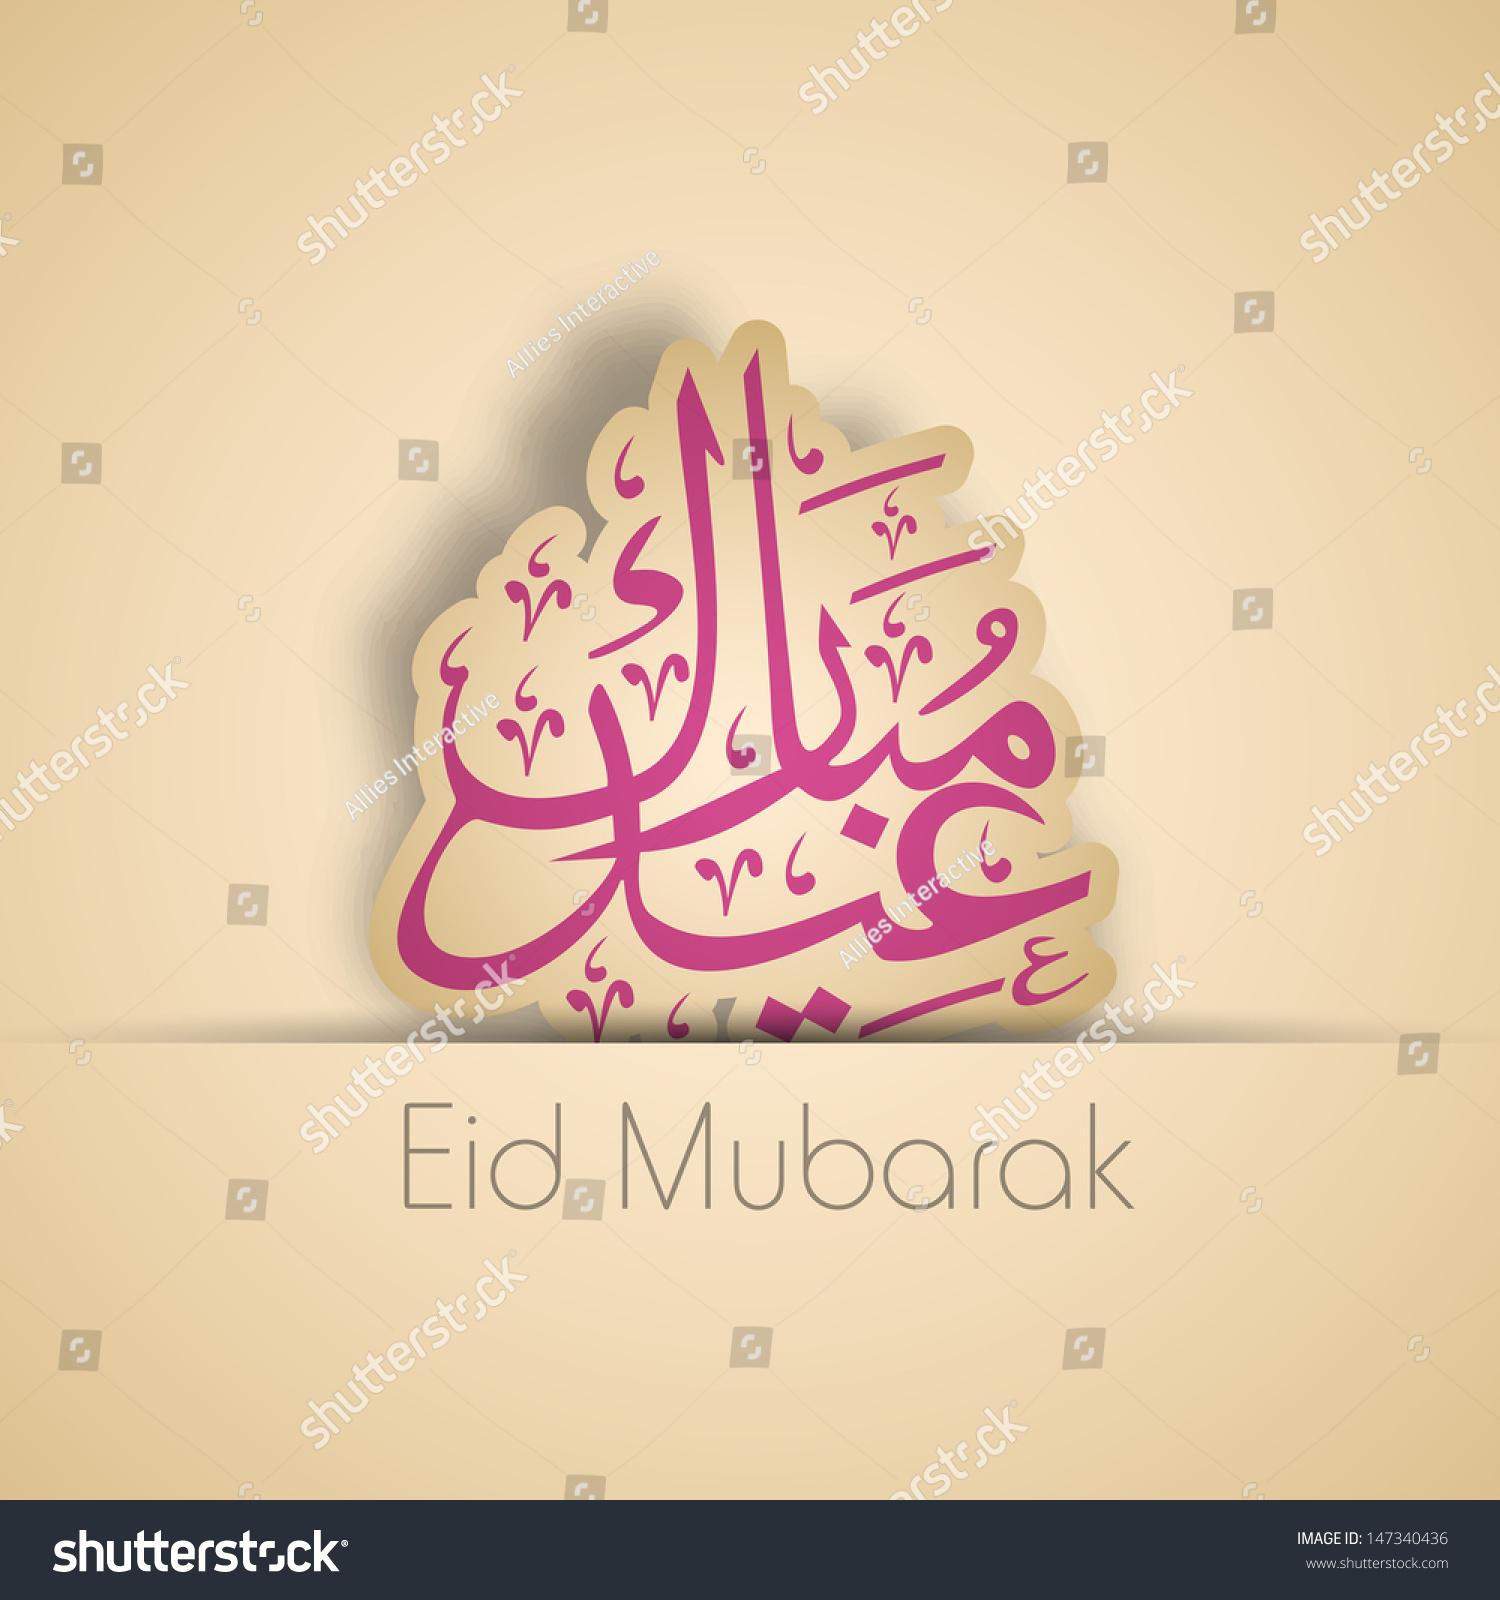 Eid Mubarak Stickers: Tag Label Sticker Design Arabic Islamic Stock Vector